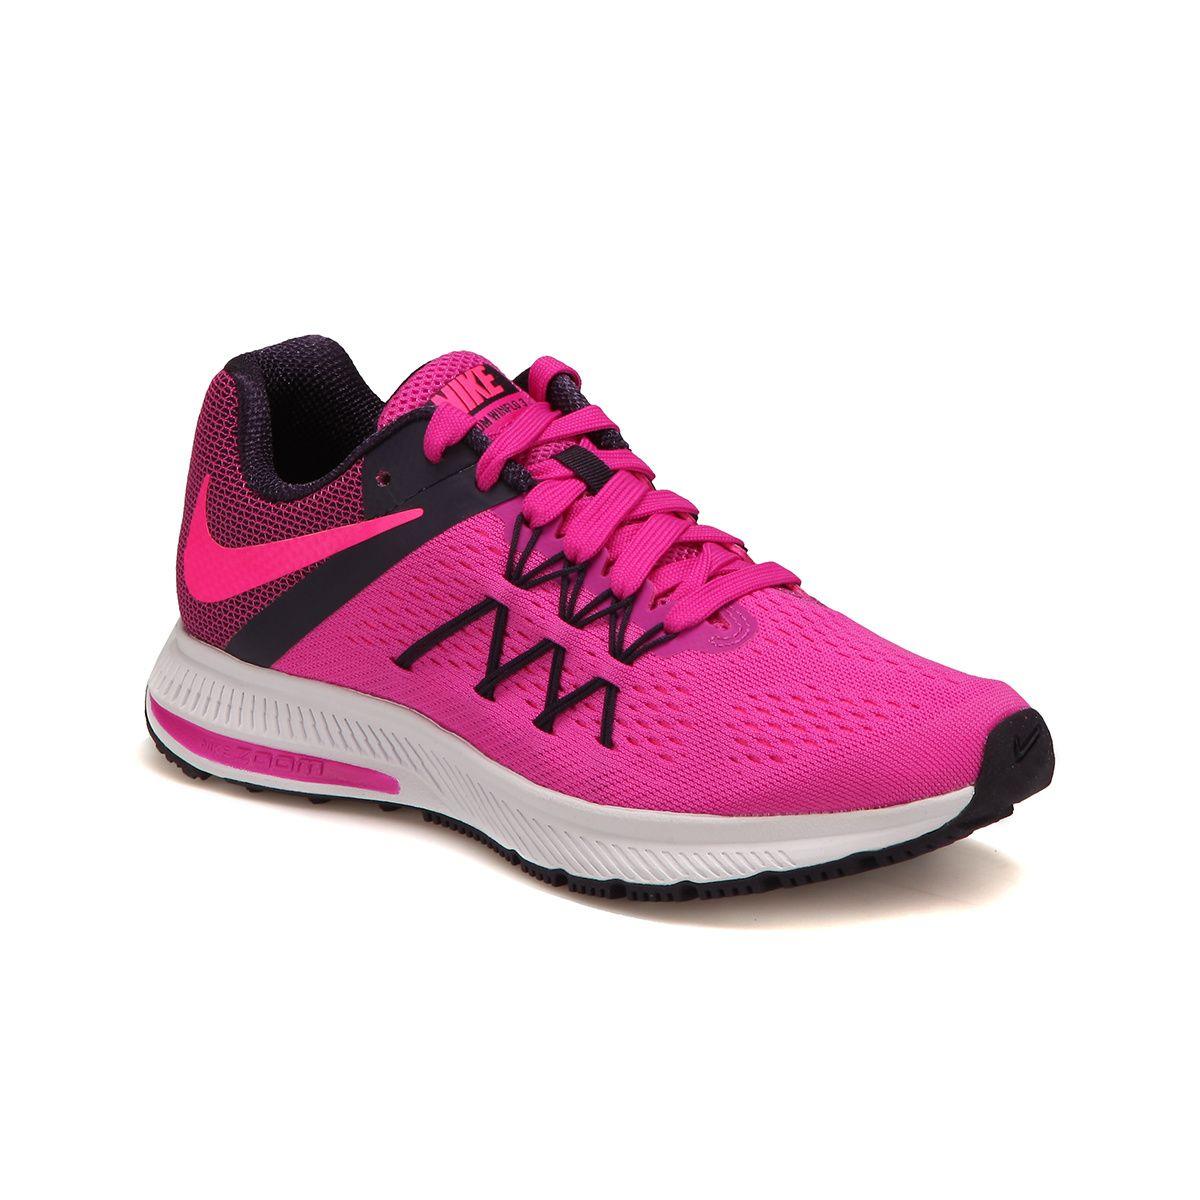 Nike Zoom Winflo 3 Pembe Kadin Kosu Ayakkabisi Spor Ayakkabi Kadin Nike Zoom Nike Ayakkabilar